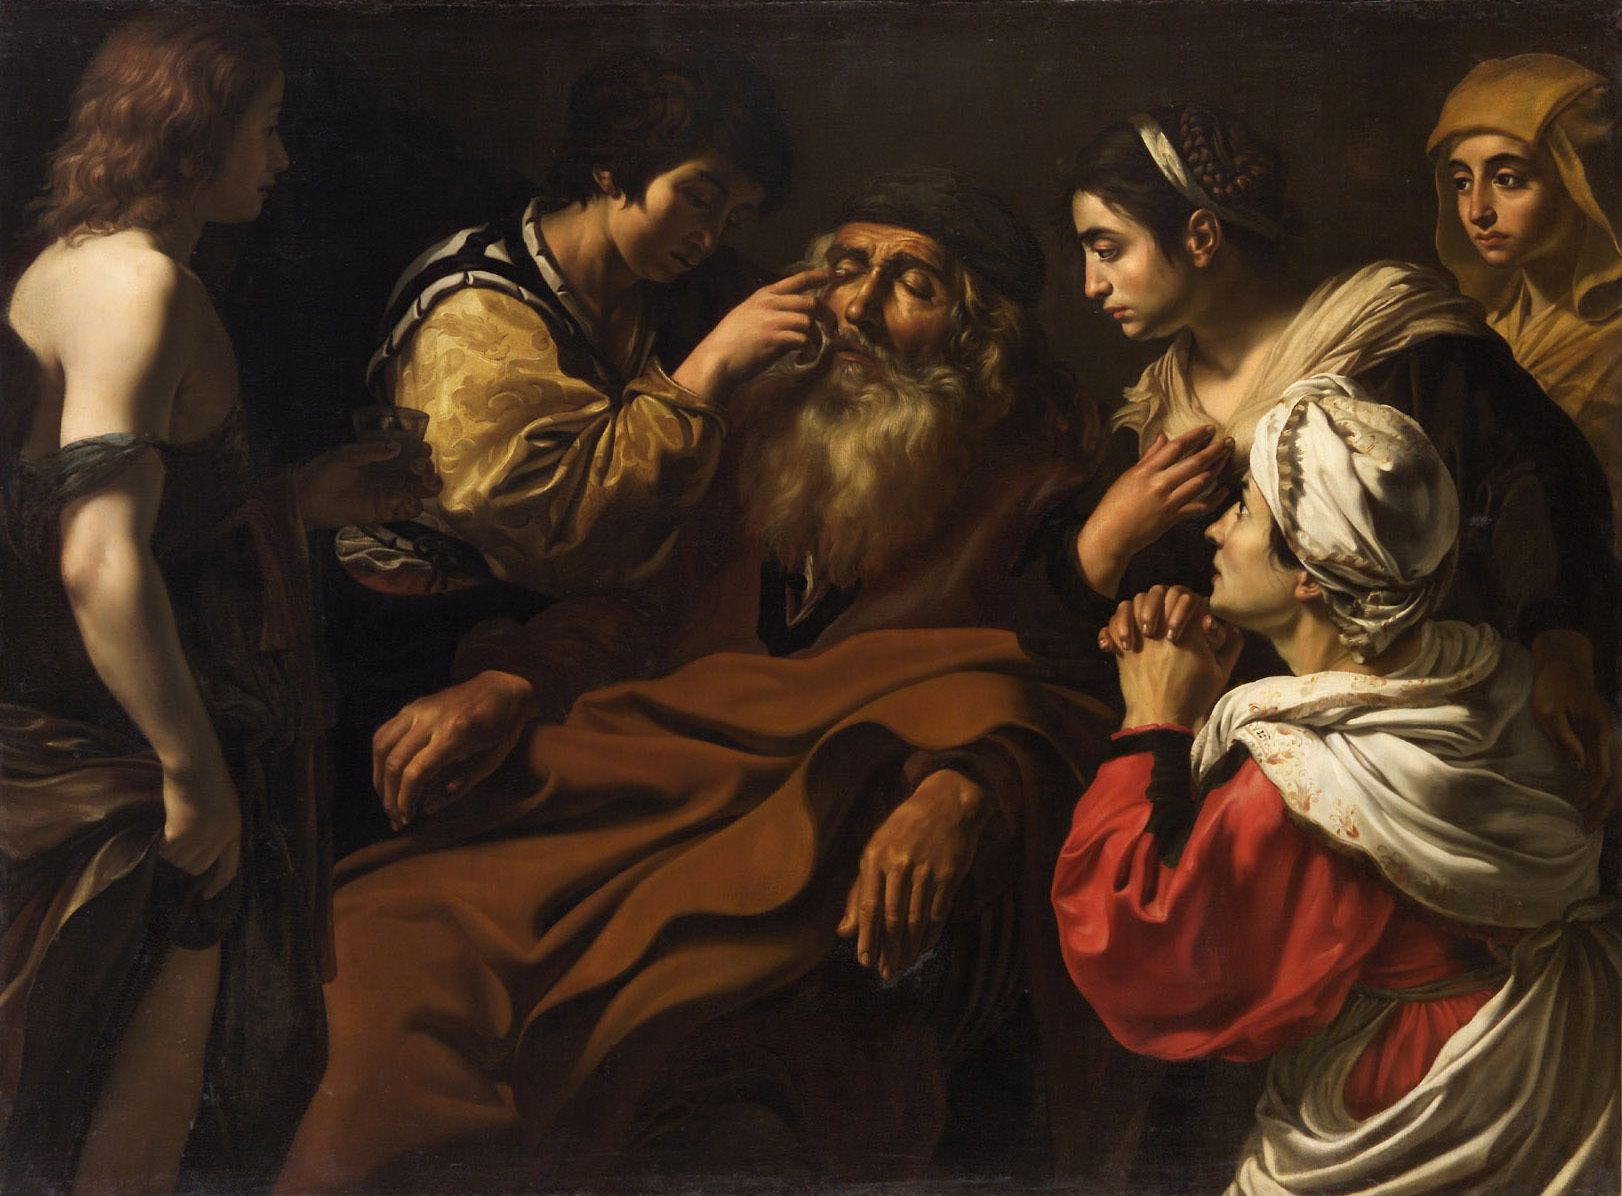 GERARD DOUFFET (attribuited). TOBIAS HEALS HIS BLIND FATHER . 1620 c. -